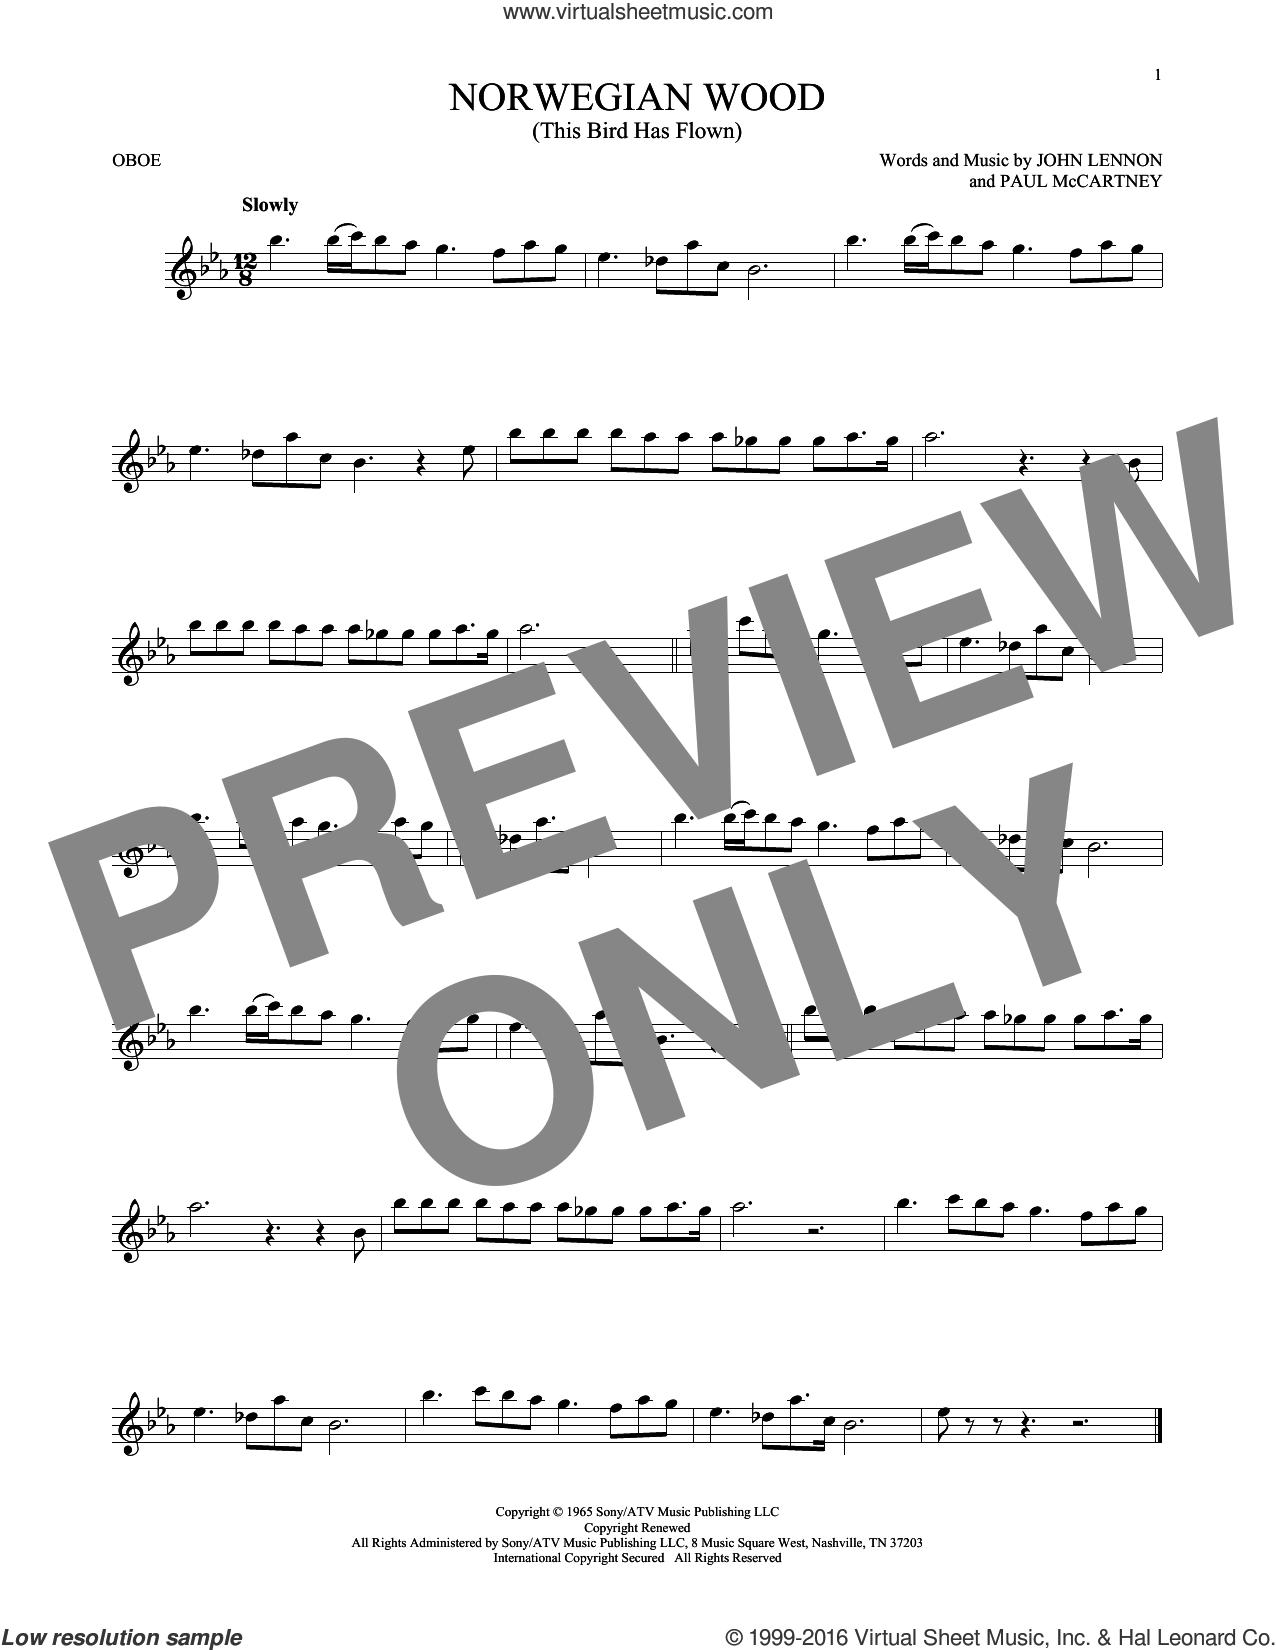 Norwegian Wood (This Bird Has Flown) sheet music for oboe solo by The Beatles, John Lennon and Paul McCartney, intermediate skill level